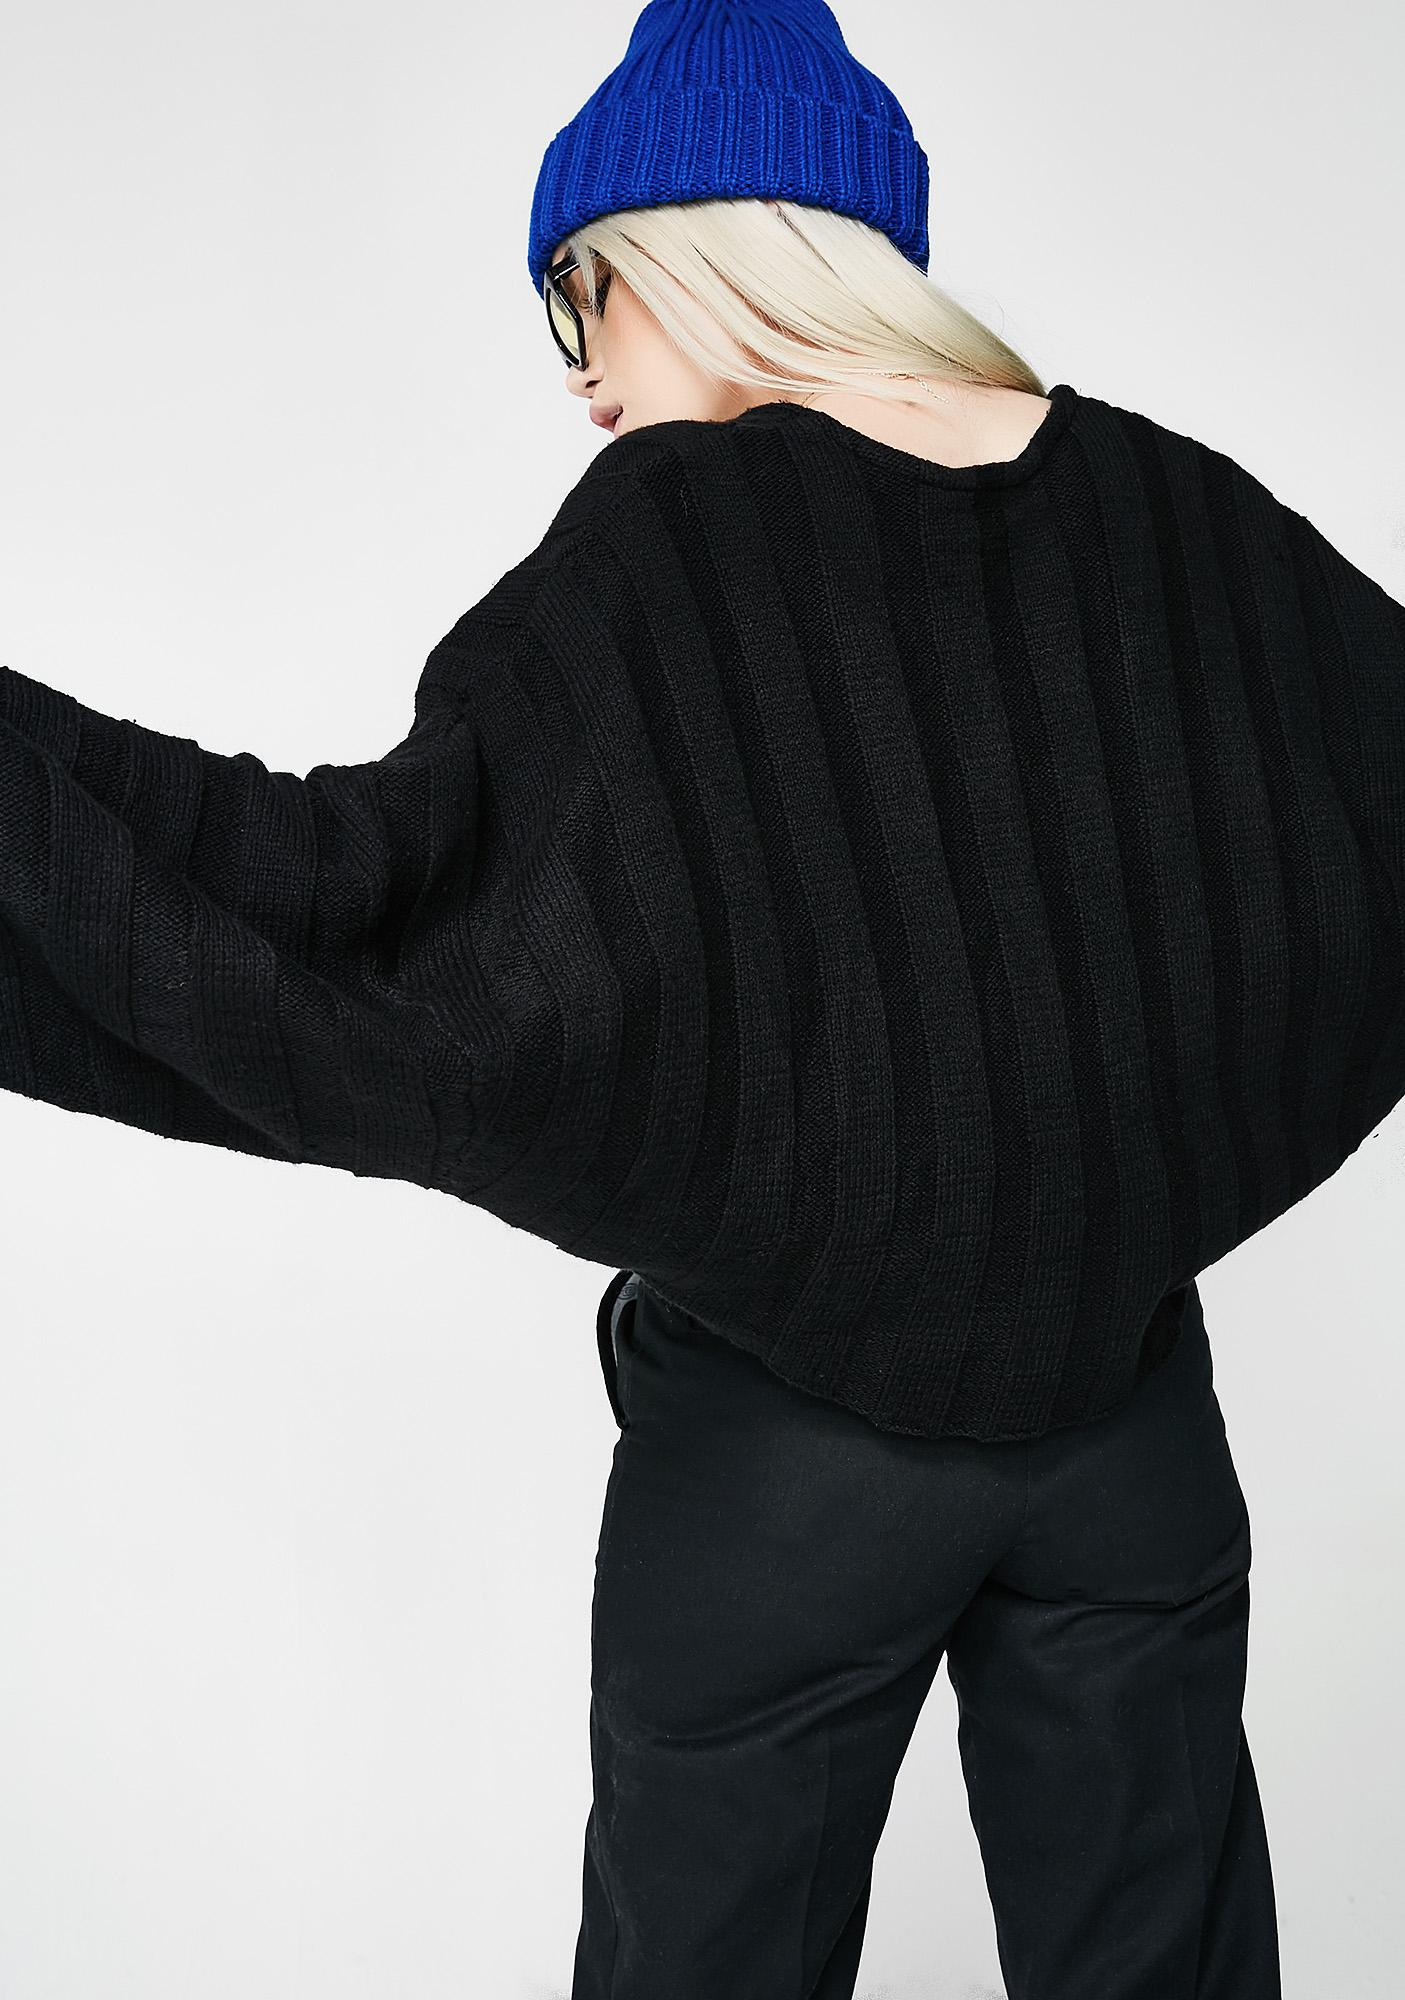 Pass That Crop Sweater